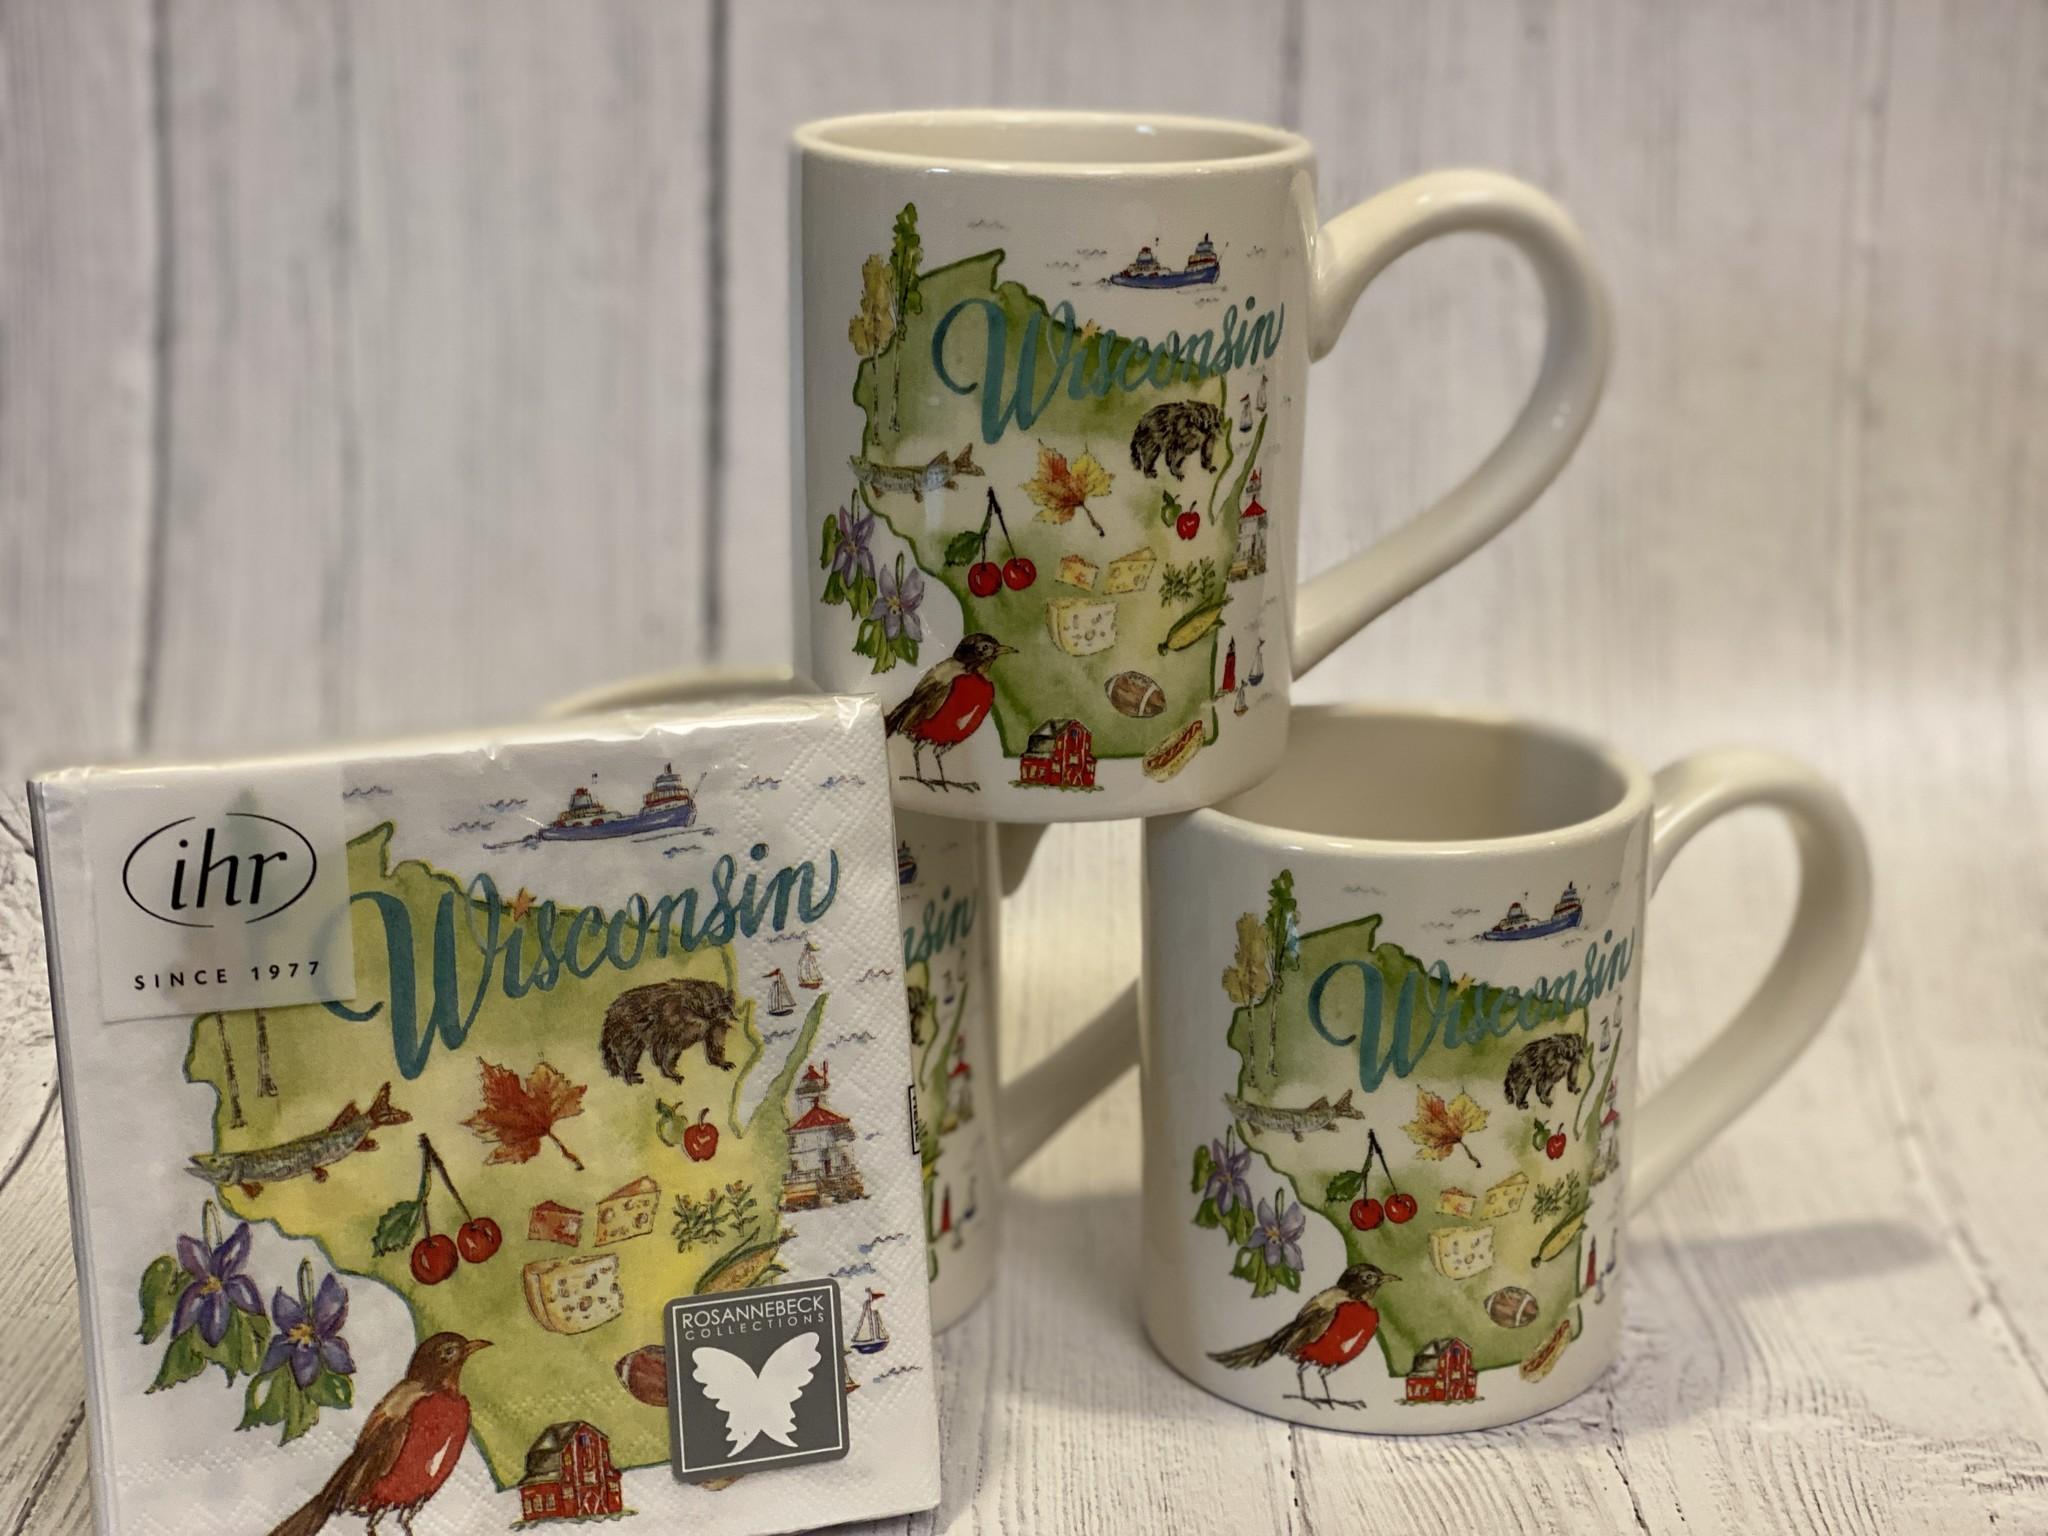 Boston Int WI State Collection Mug